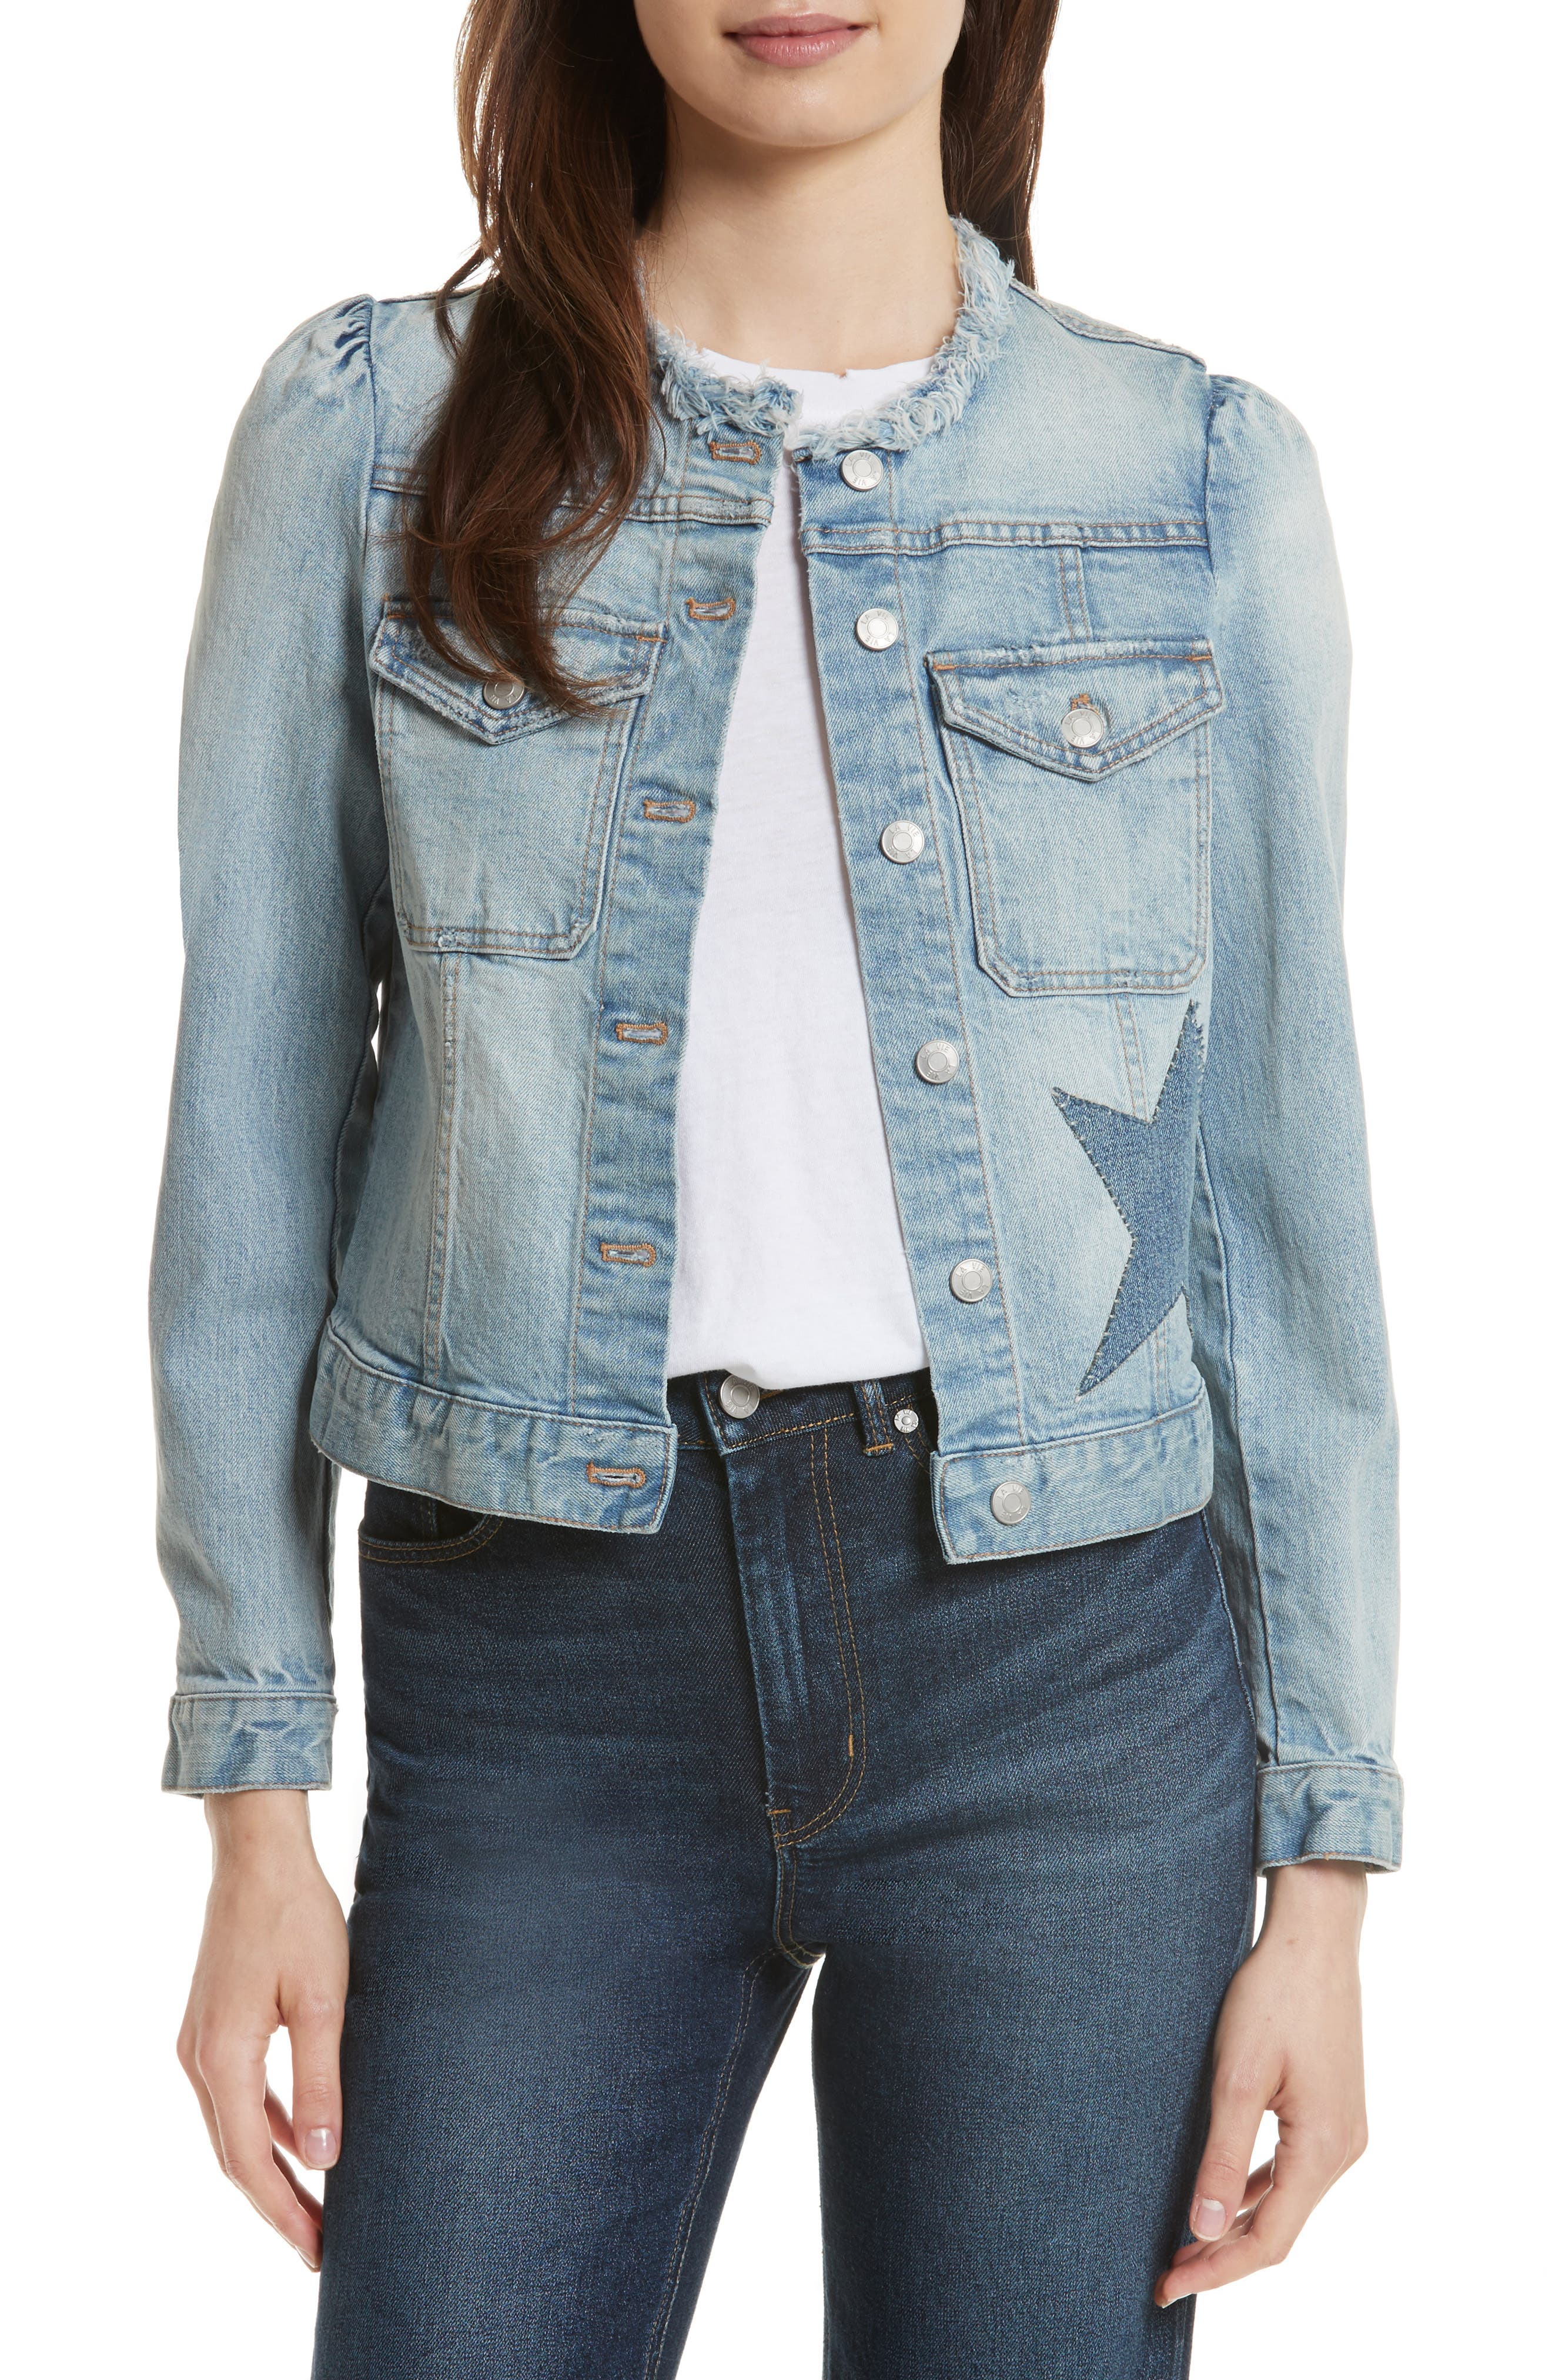 La Vie Rebecca Taylor Star Patch Denim Jacket